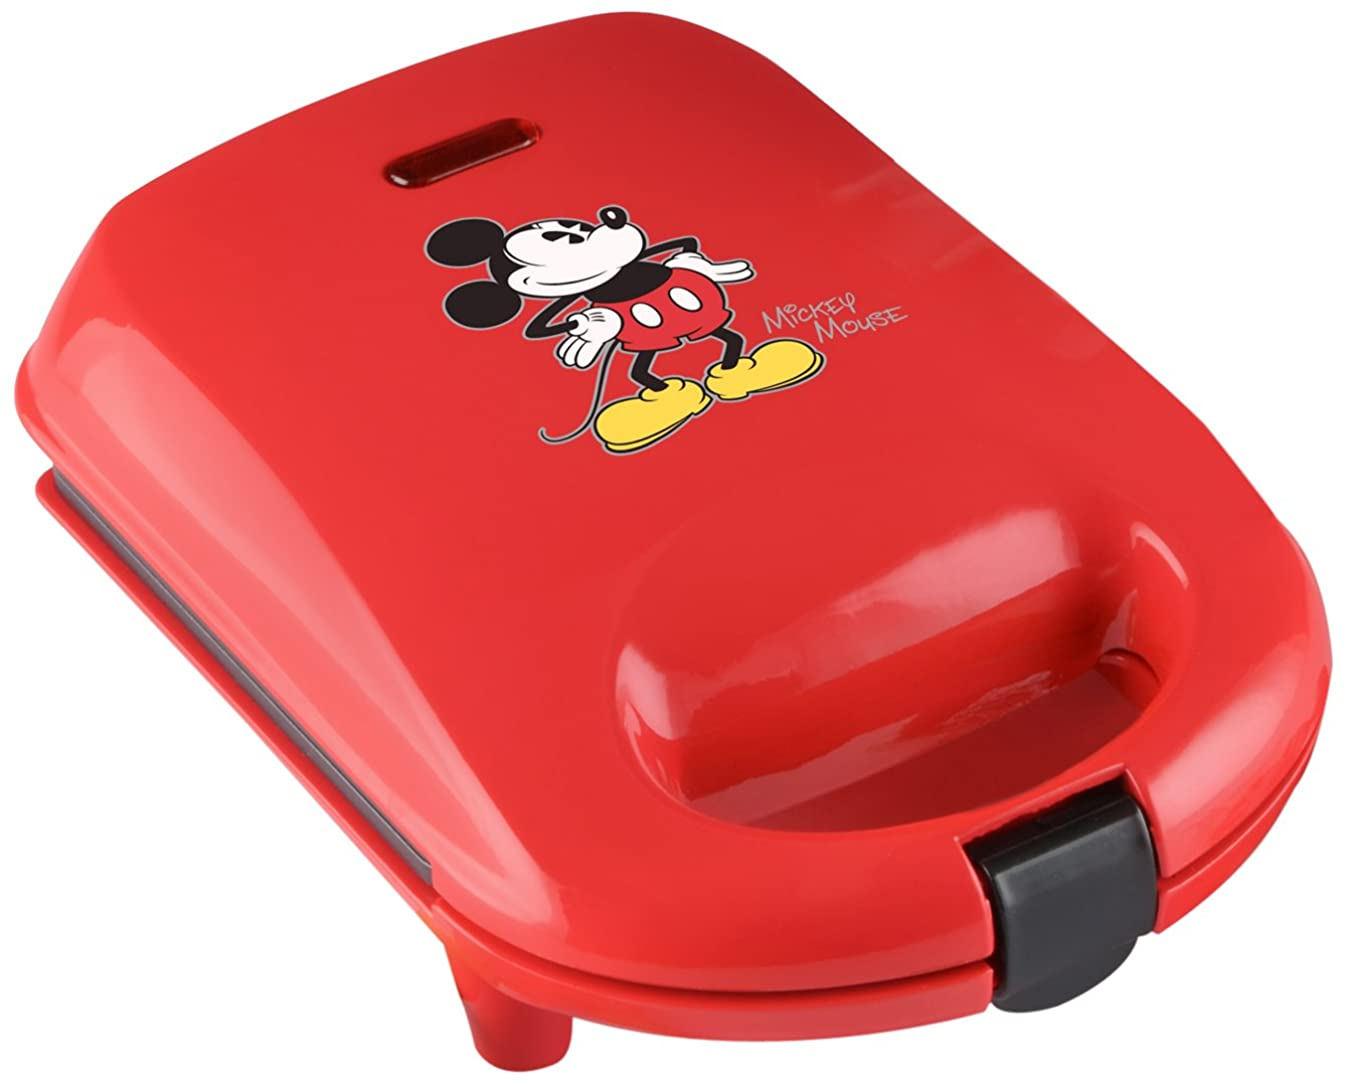 Disney DCM-8 Cake Pop Maker, One Size, Red